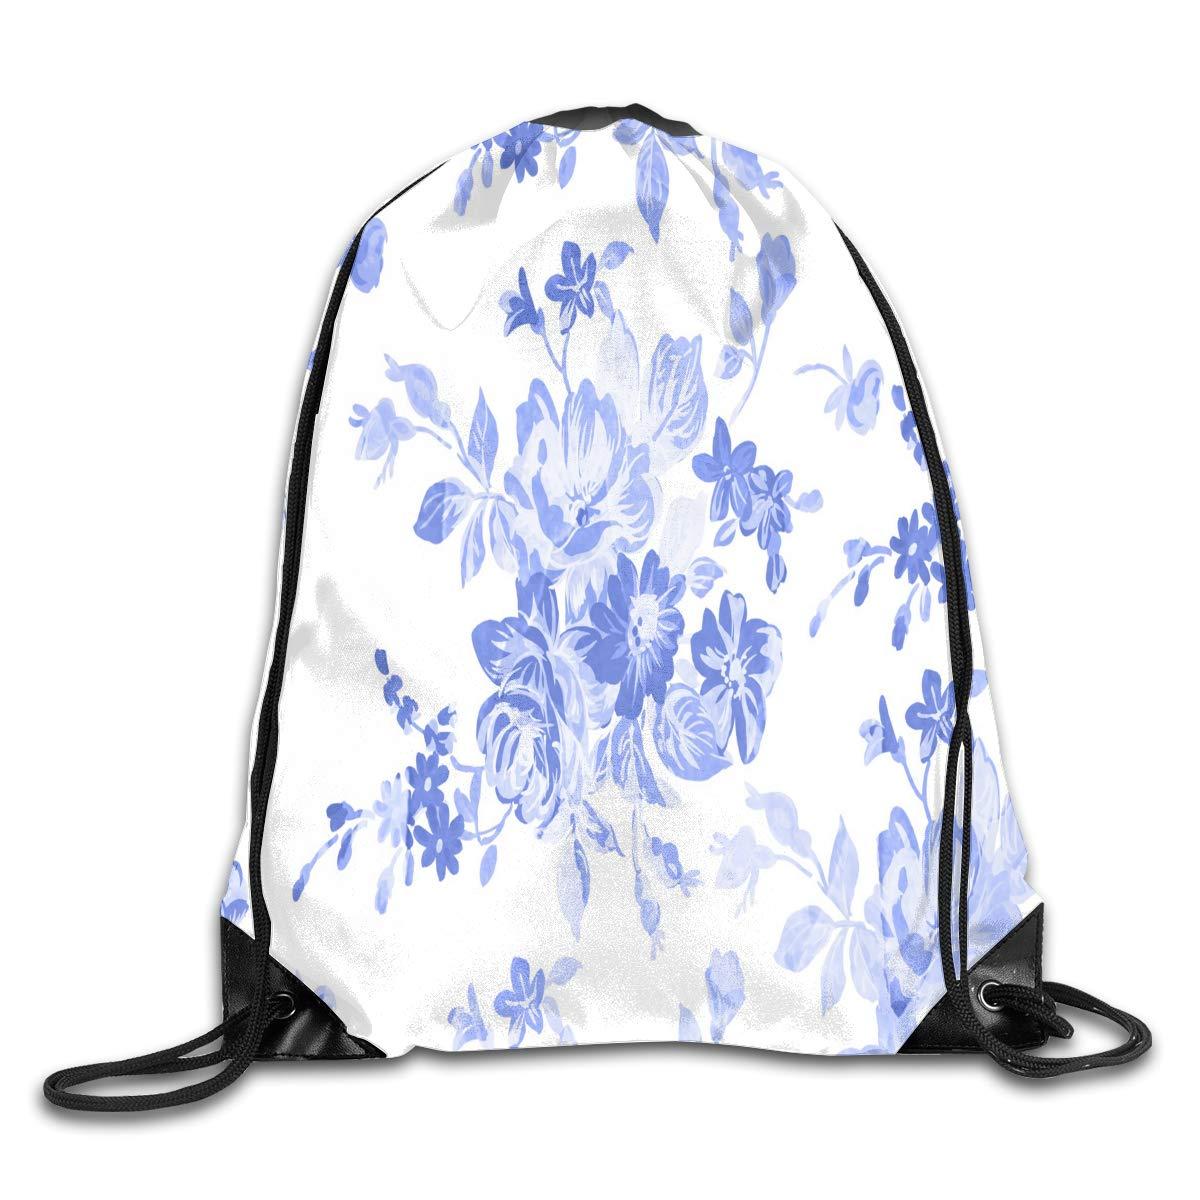 Travel Duffels Watercolor Unicorn Floral Duffle Bag Luggage Sports Gym for Women /& Men